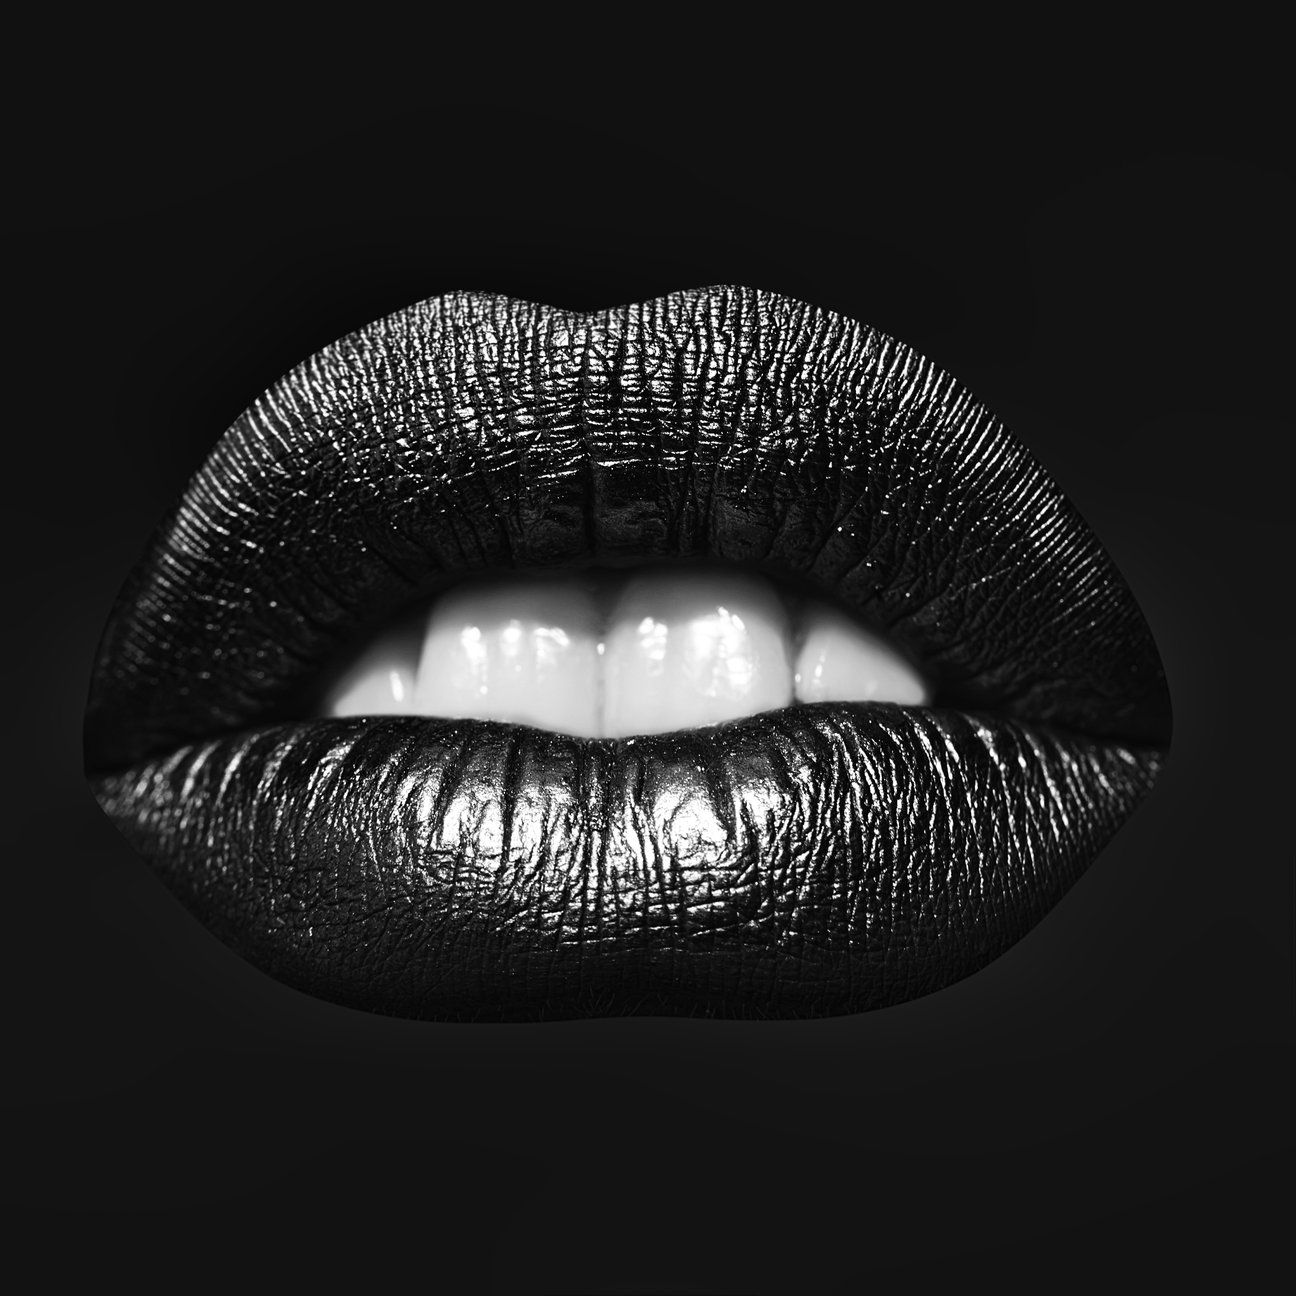 Black and white lips Poster Art – Kissing Cockatoo   Black and white  photography portraits, Black and white art drawing, White lips